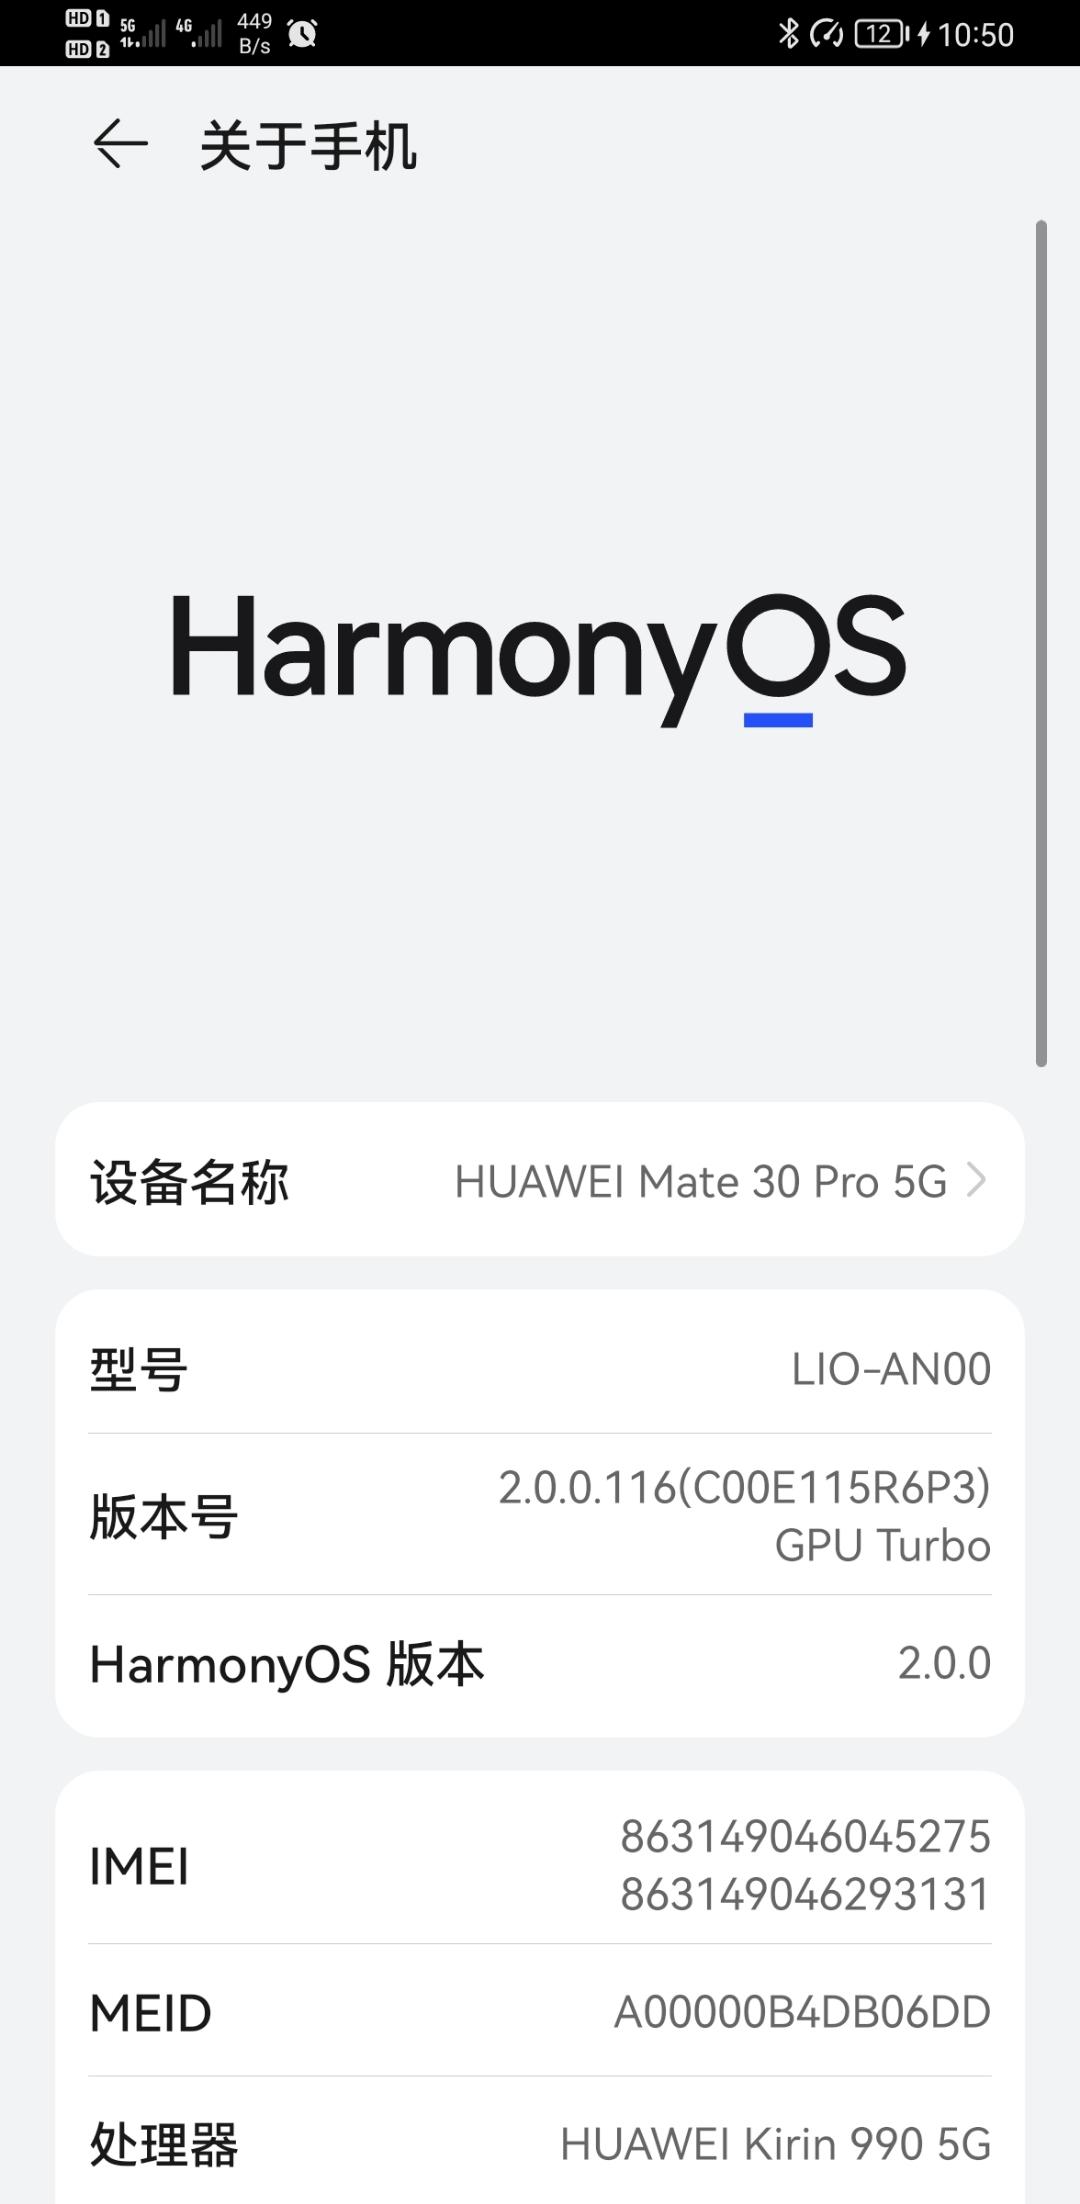 Screenshot_20210603_105034_com.android.settings.jpg